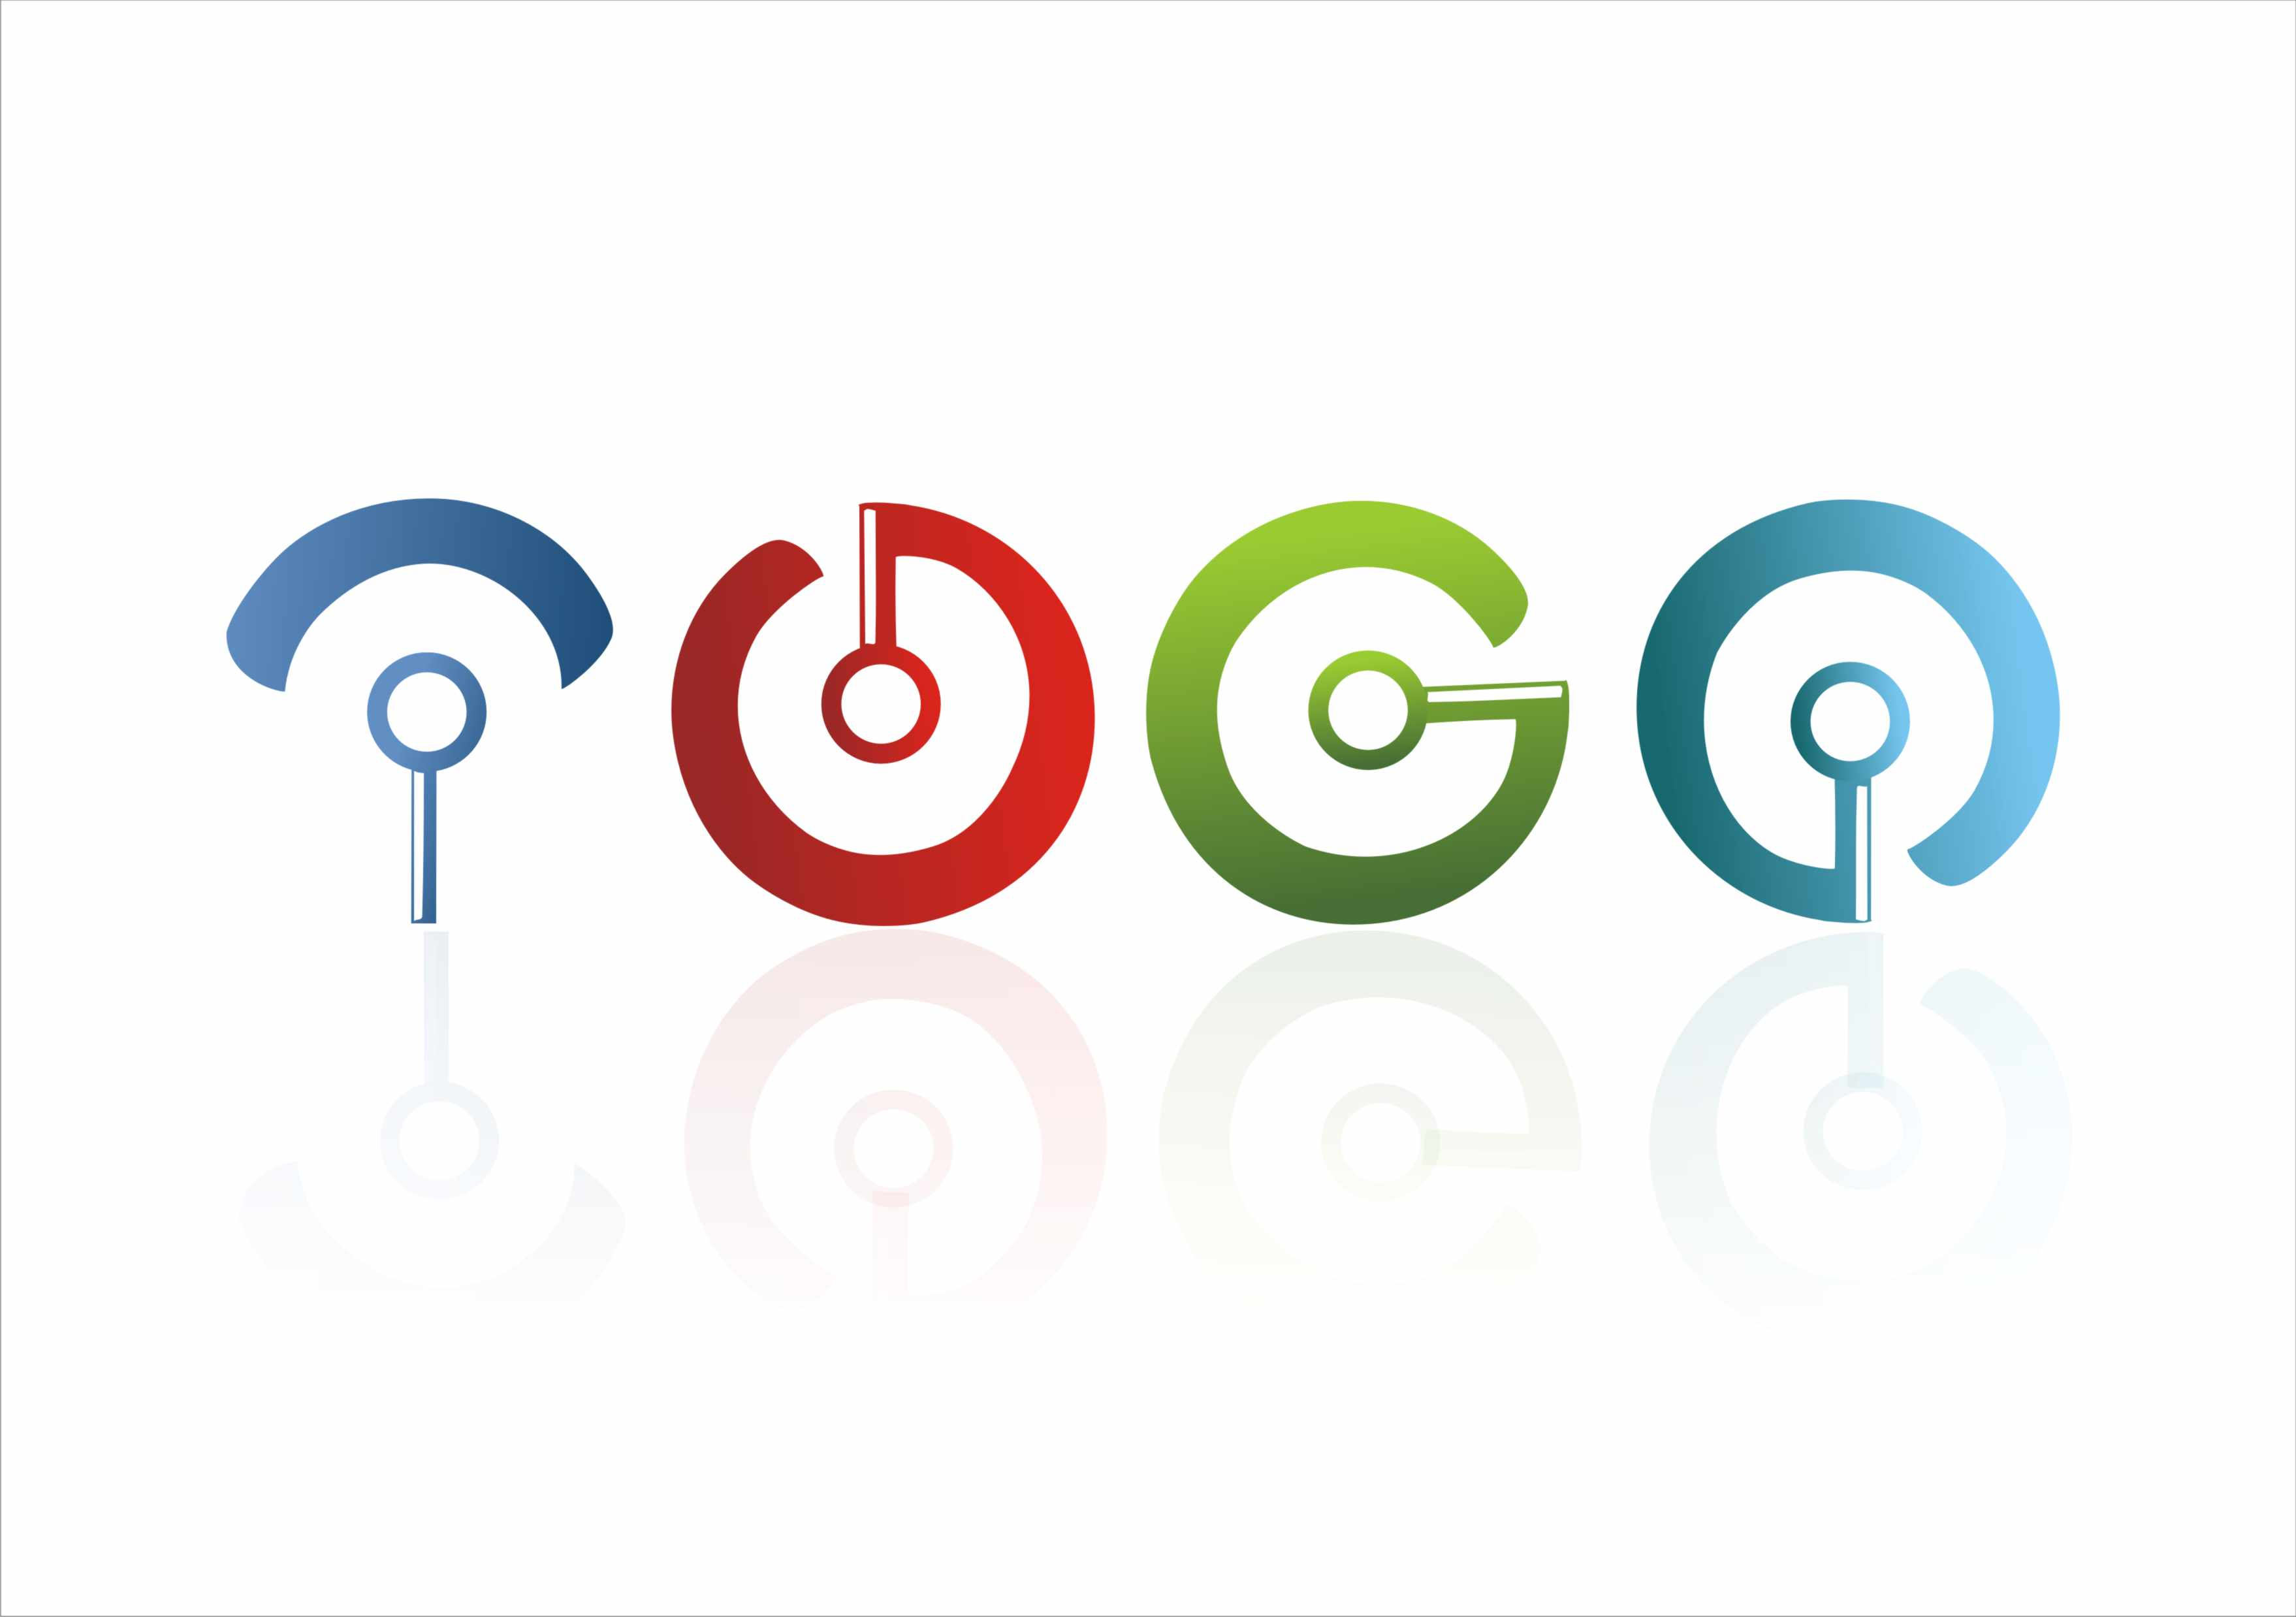 Разработать логотип и экран загрузки приложения фото f_4465a81ca6d05516.jpg